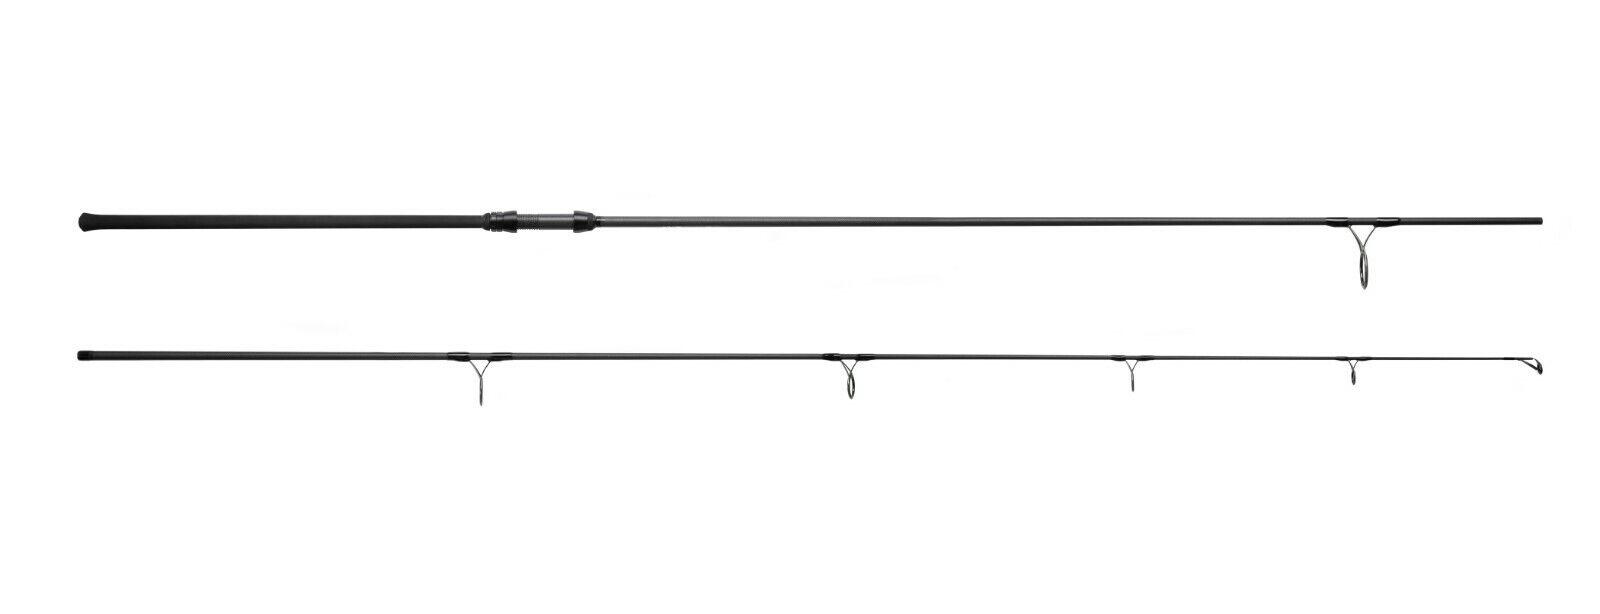 Century C2 SP Carp Rod Full Range NEW Command And Control Rod